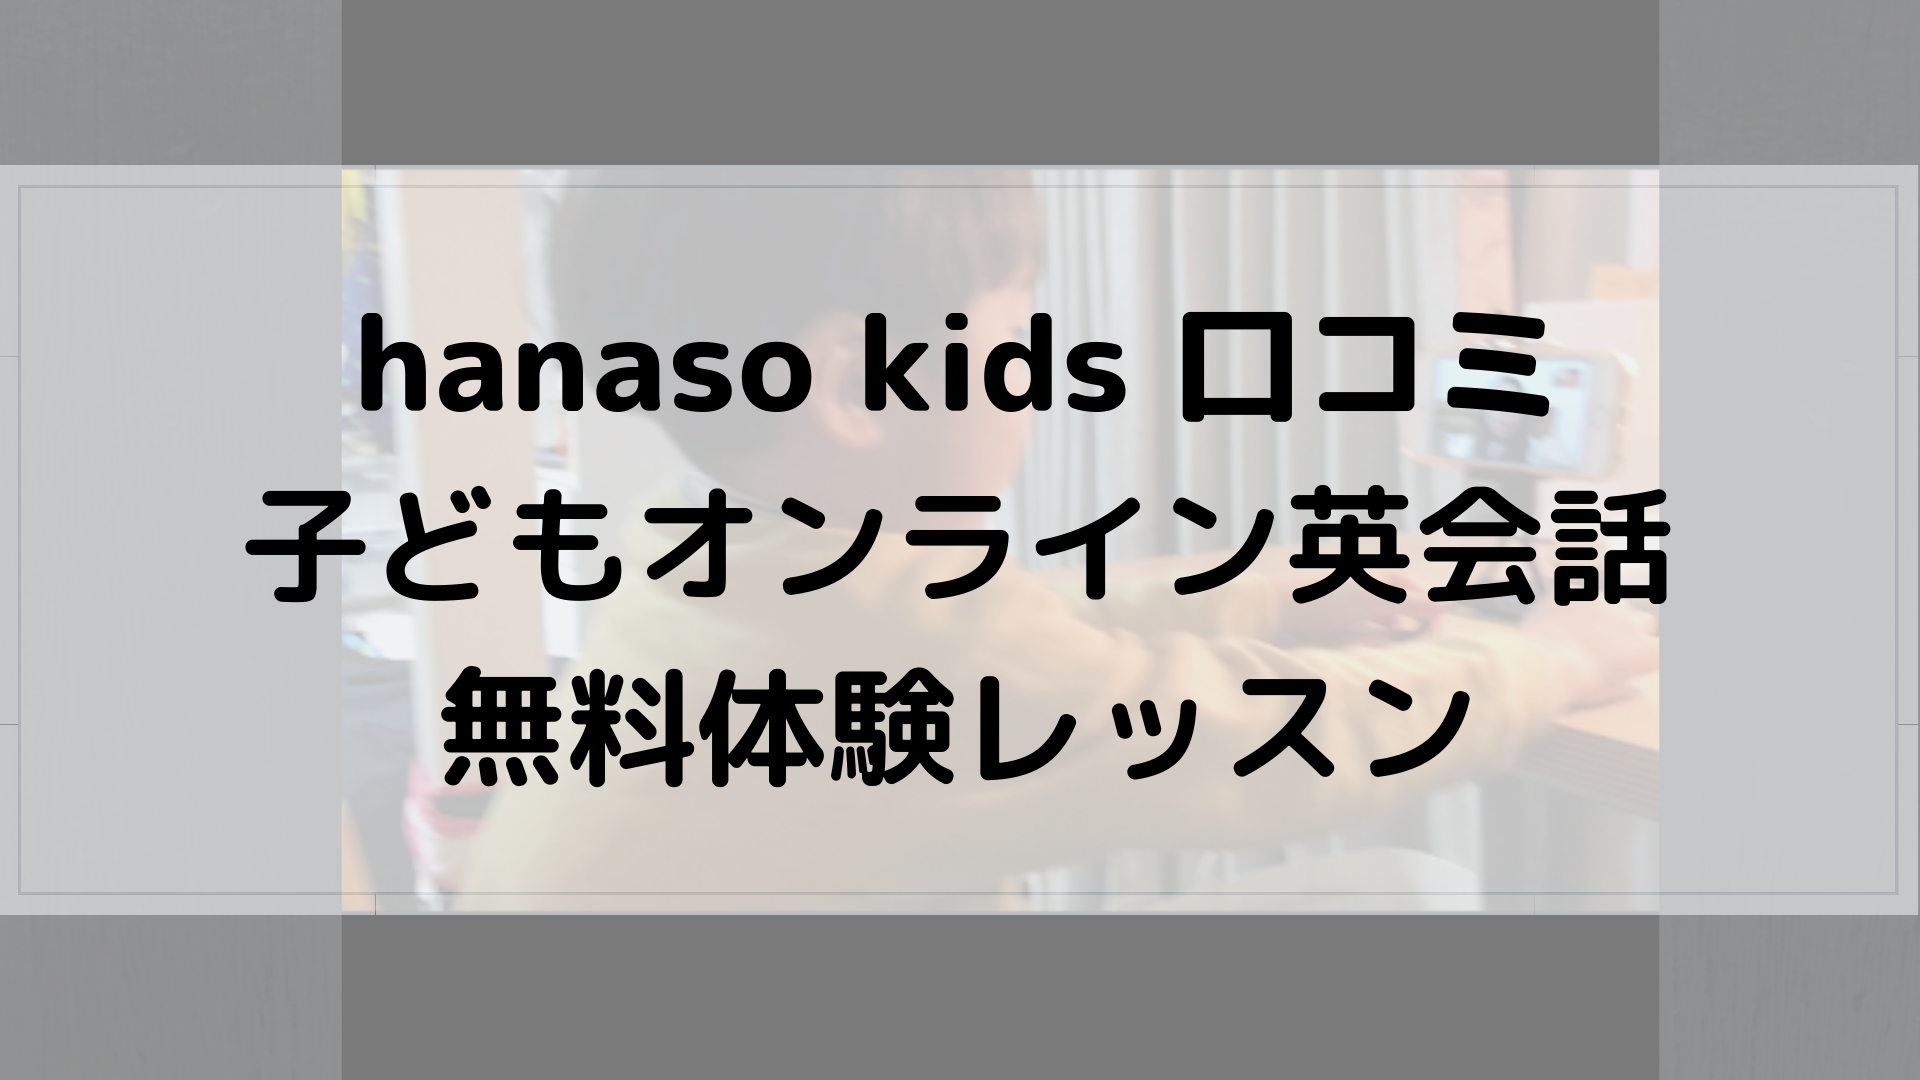 hanaso kids 口コミ